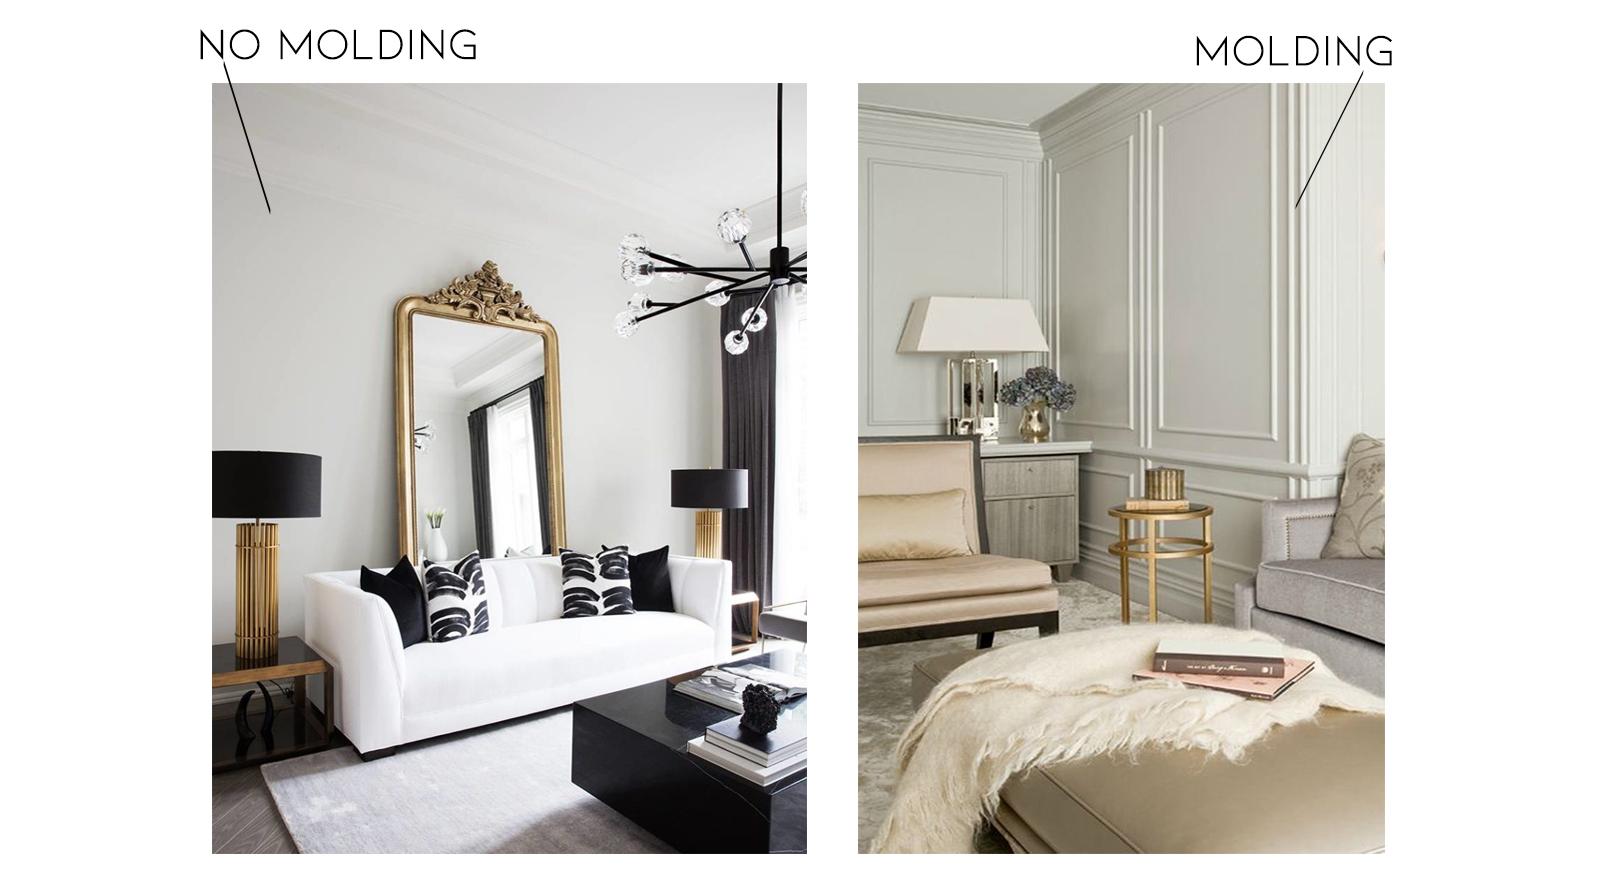 molding-vs-no-molding